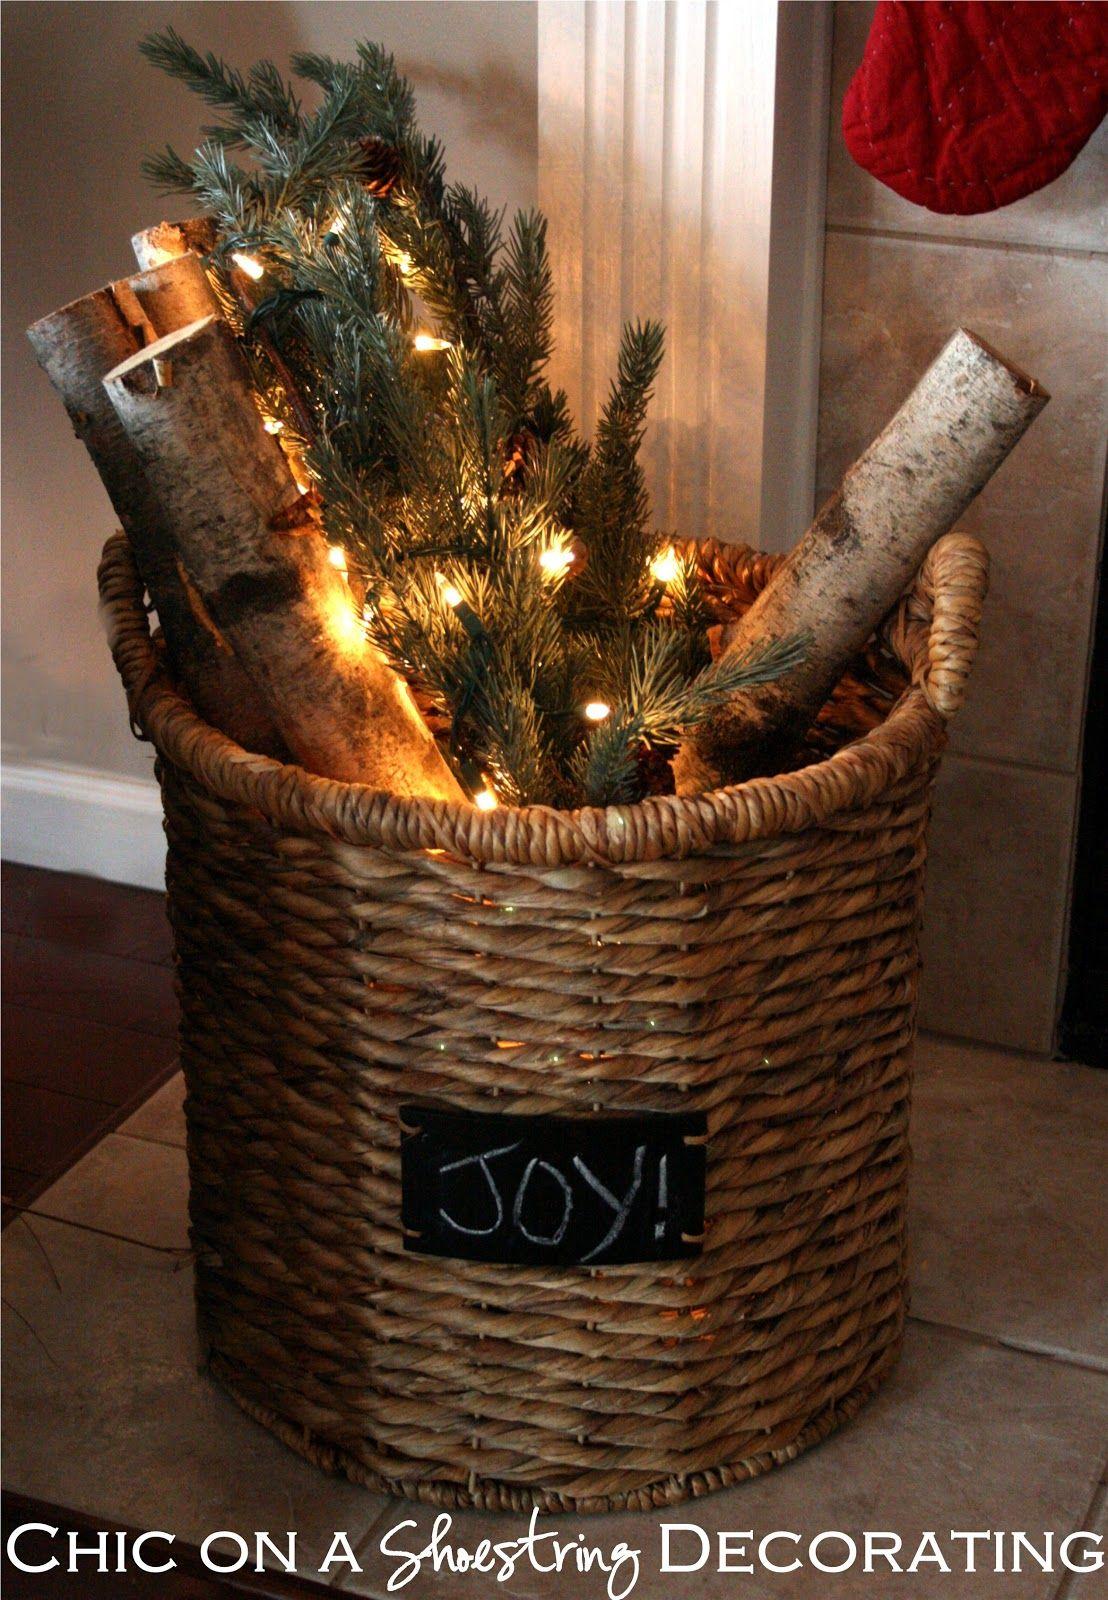 birch branch & greenery basket, Rustic Christmas Mantel @ Chic on a Shoestring Decorating blog